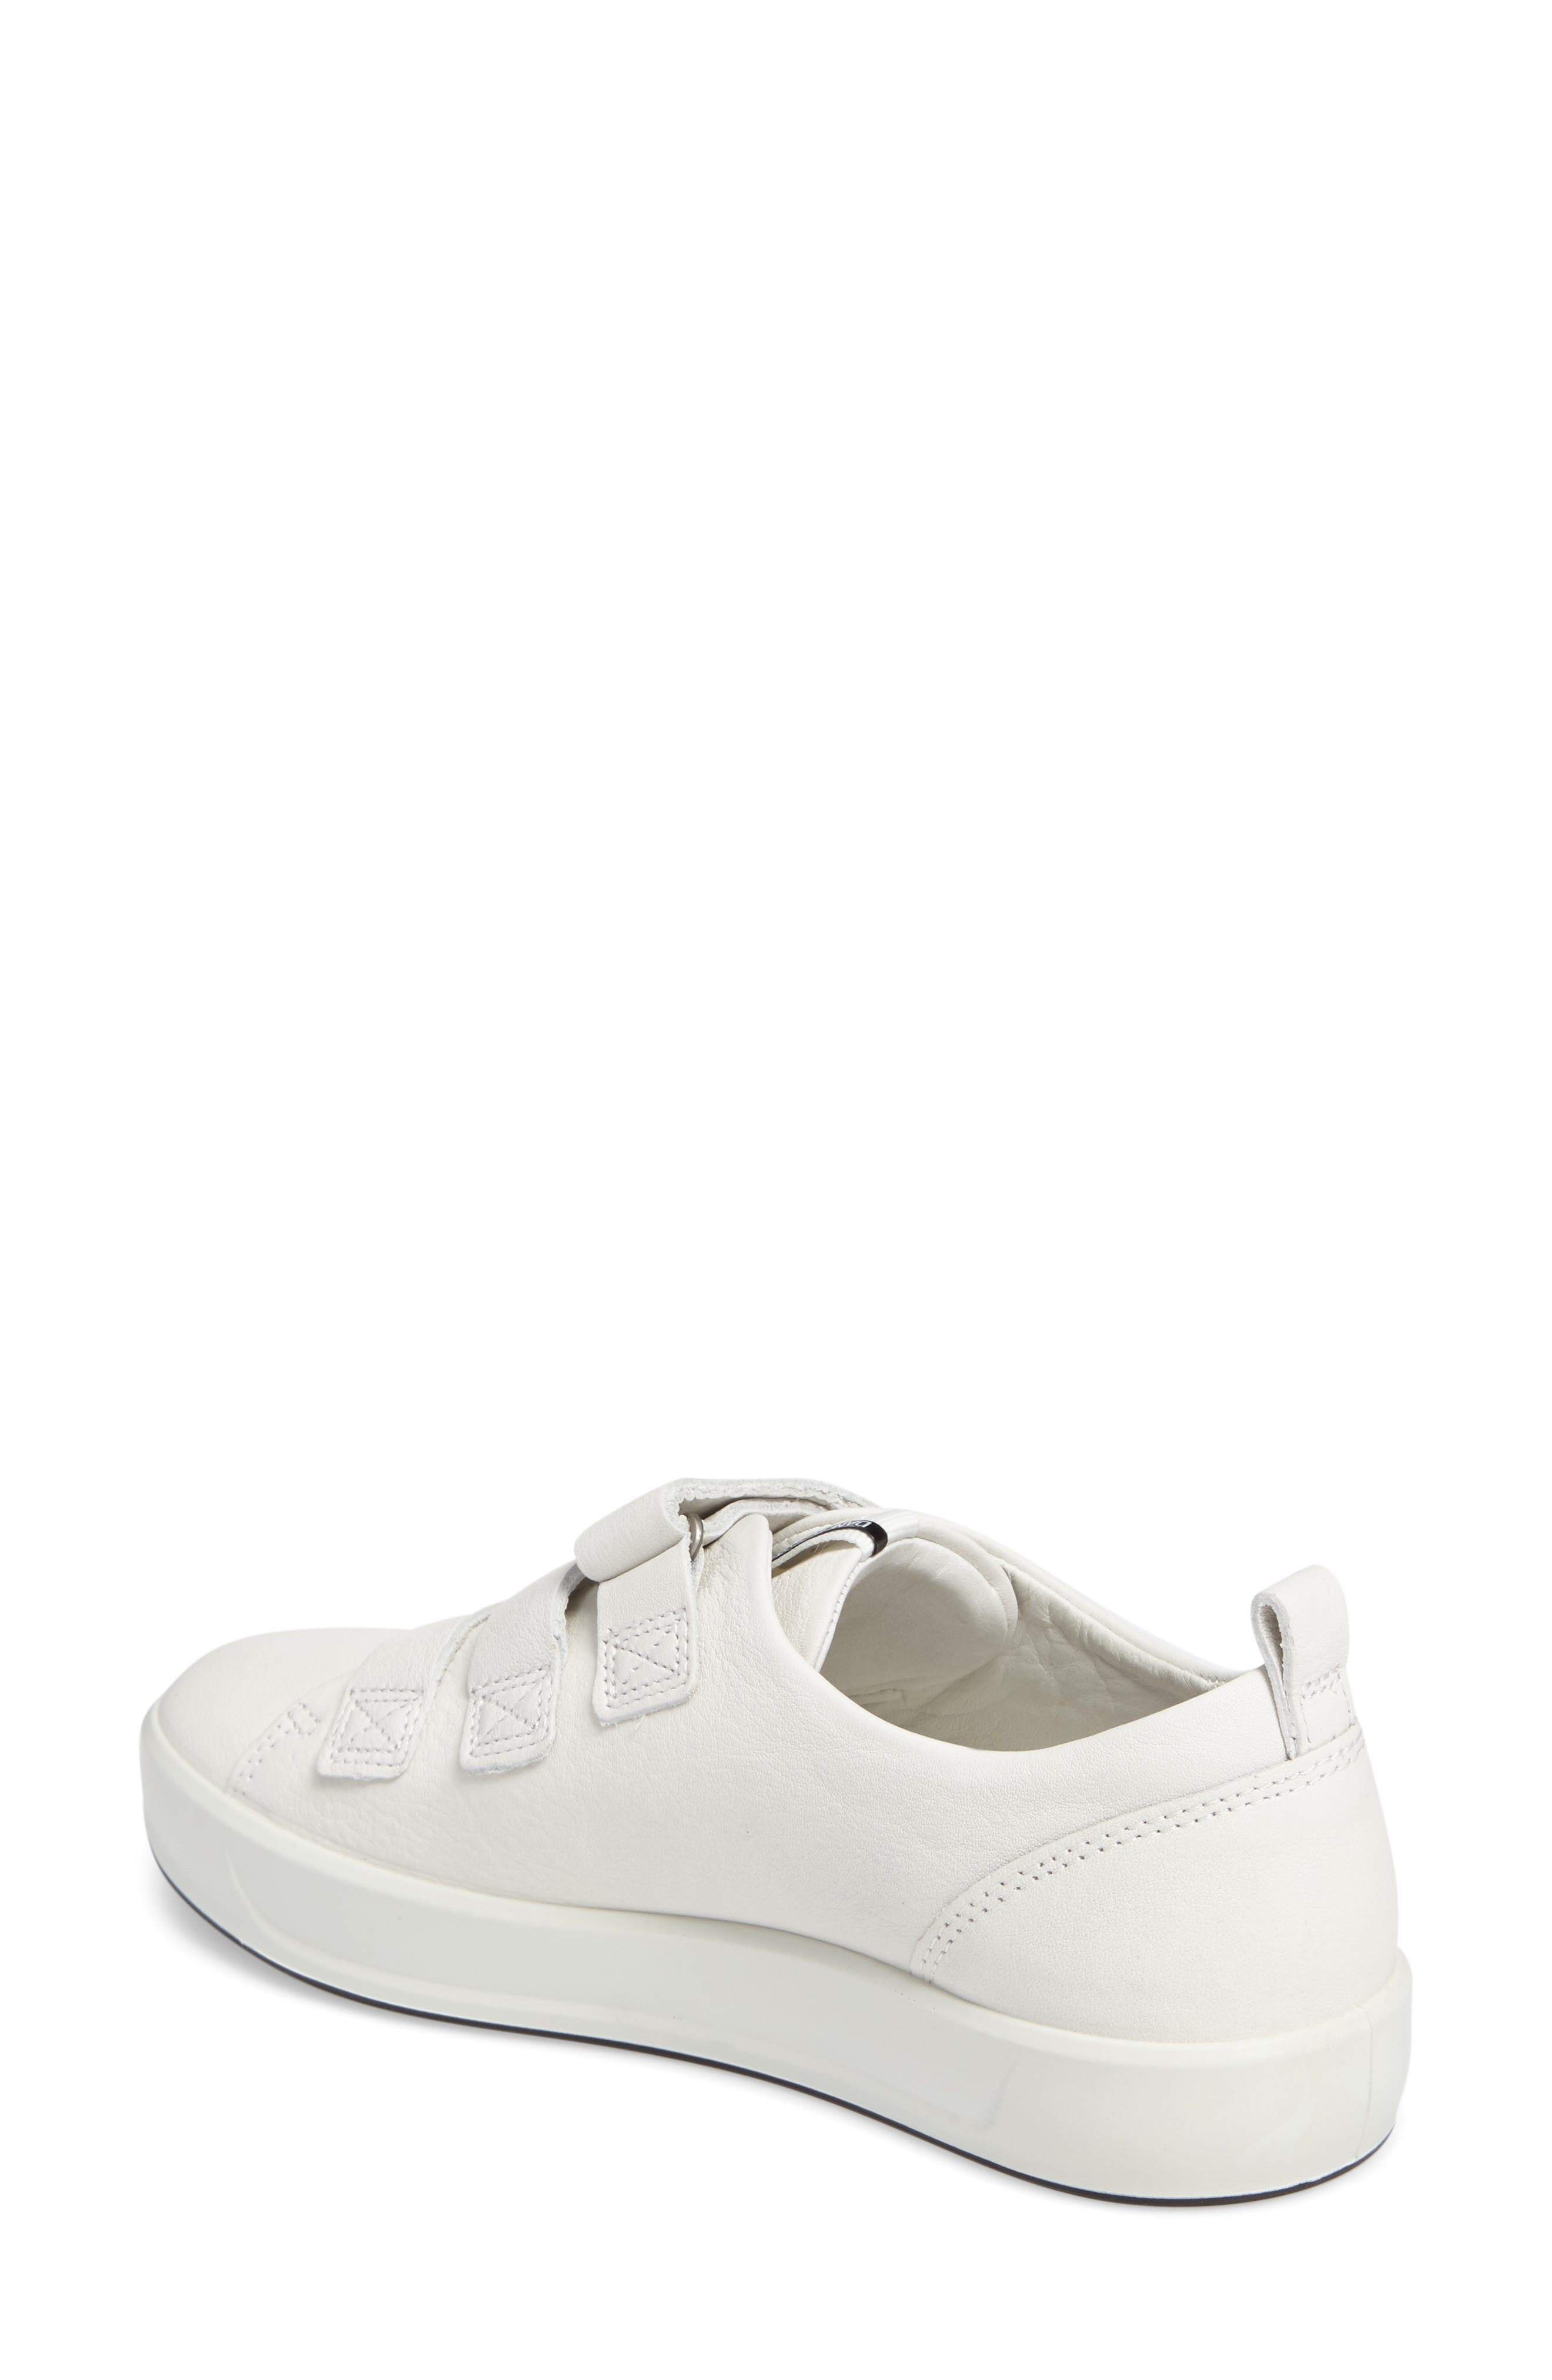 Soft 8 Sneaker,                             Alternate thumbnail 2, color,                             White Leather